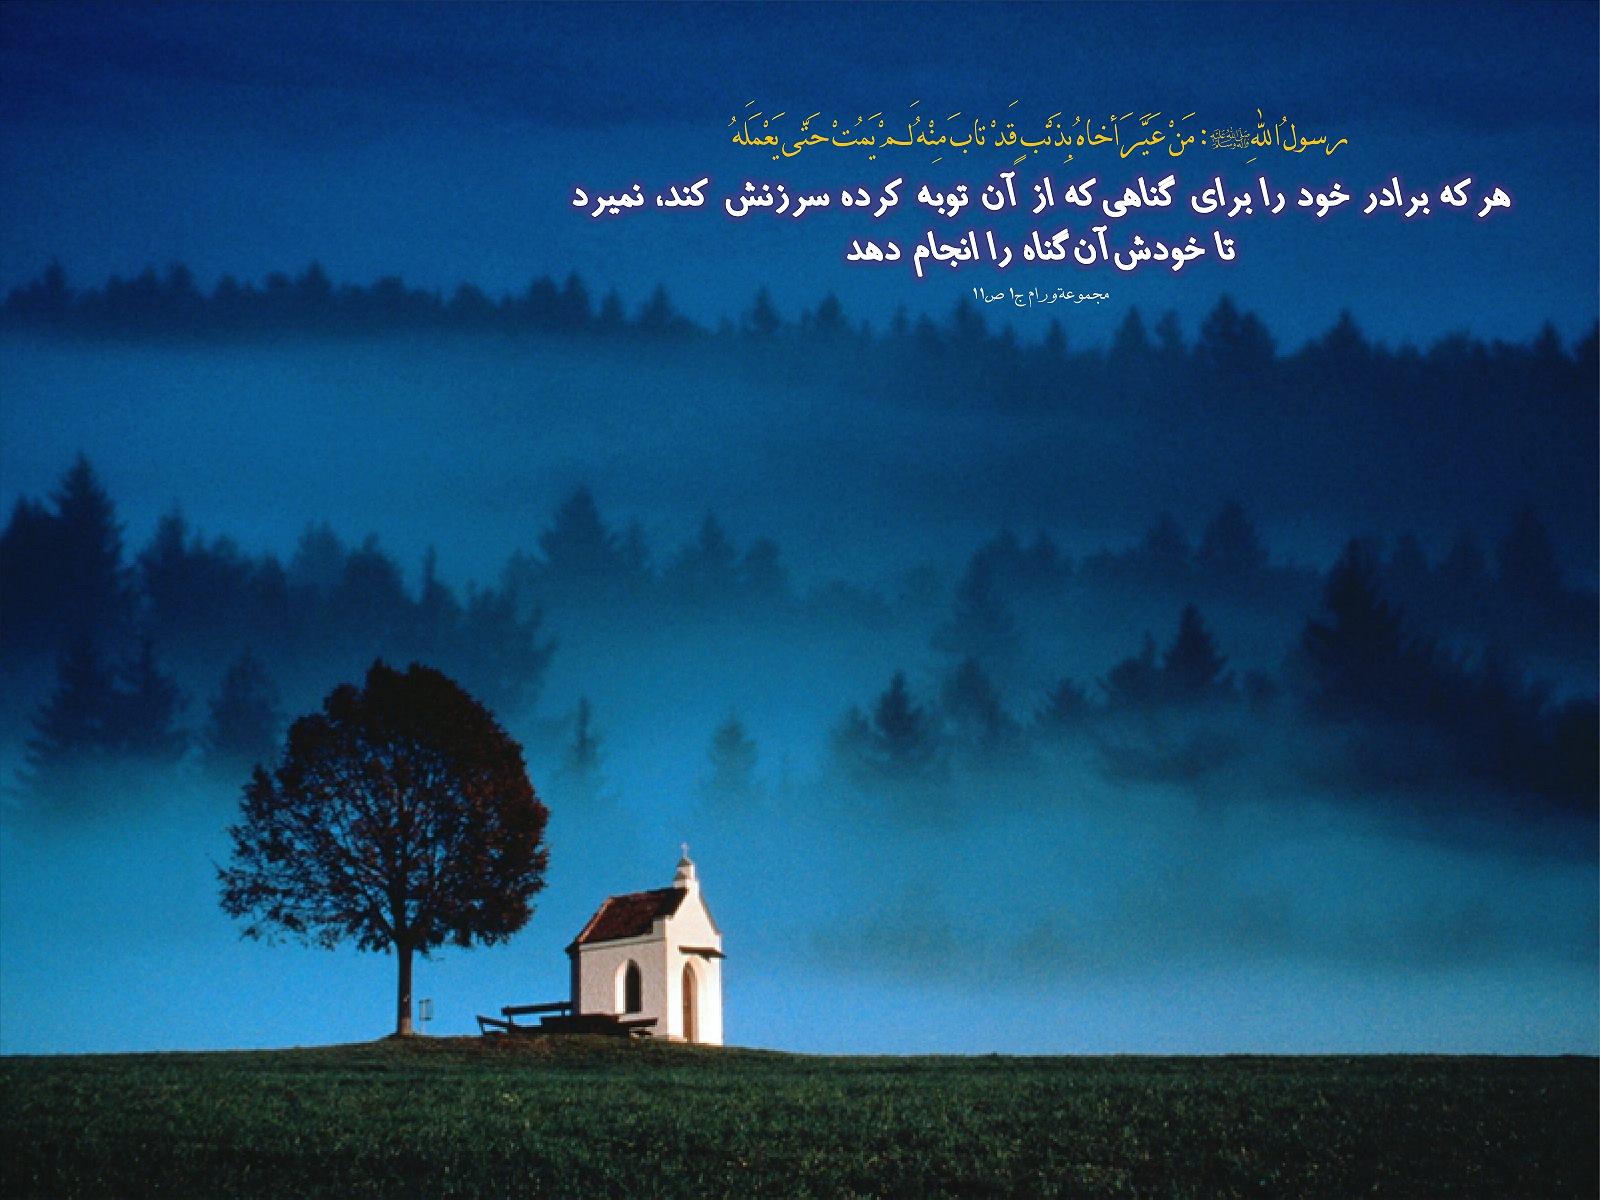 http://ehya-amrebemarof.persiangig.com/image/641Hadis%20H519.jpg